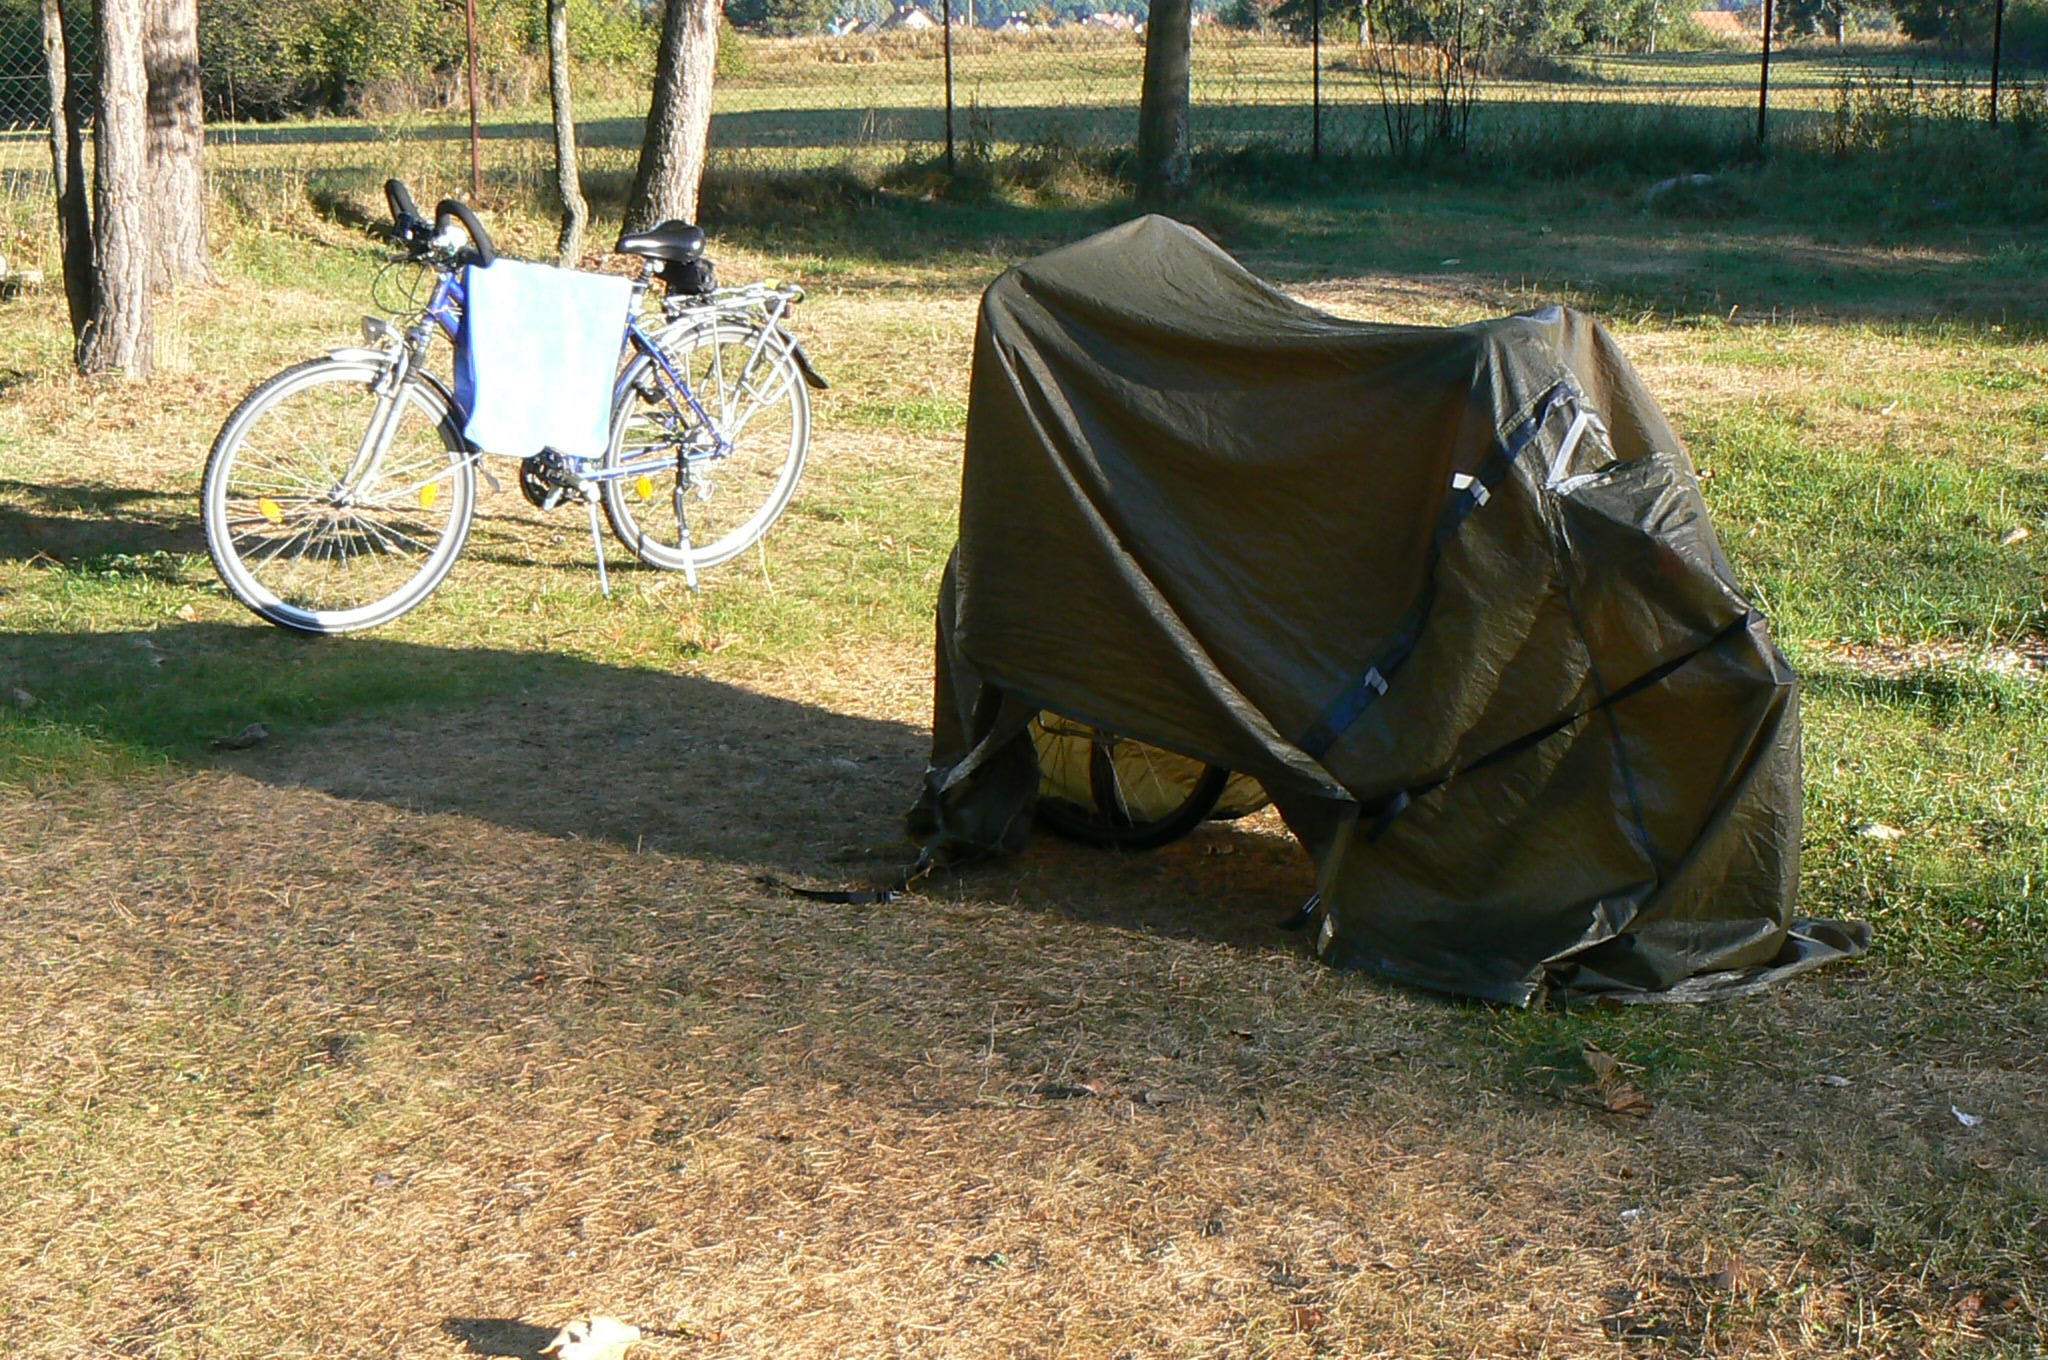 Tent on bike